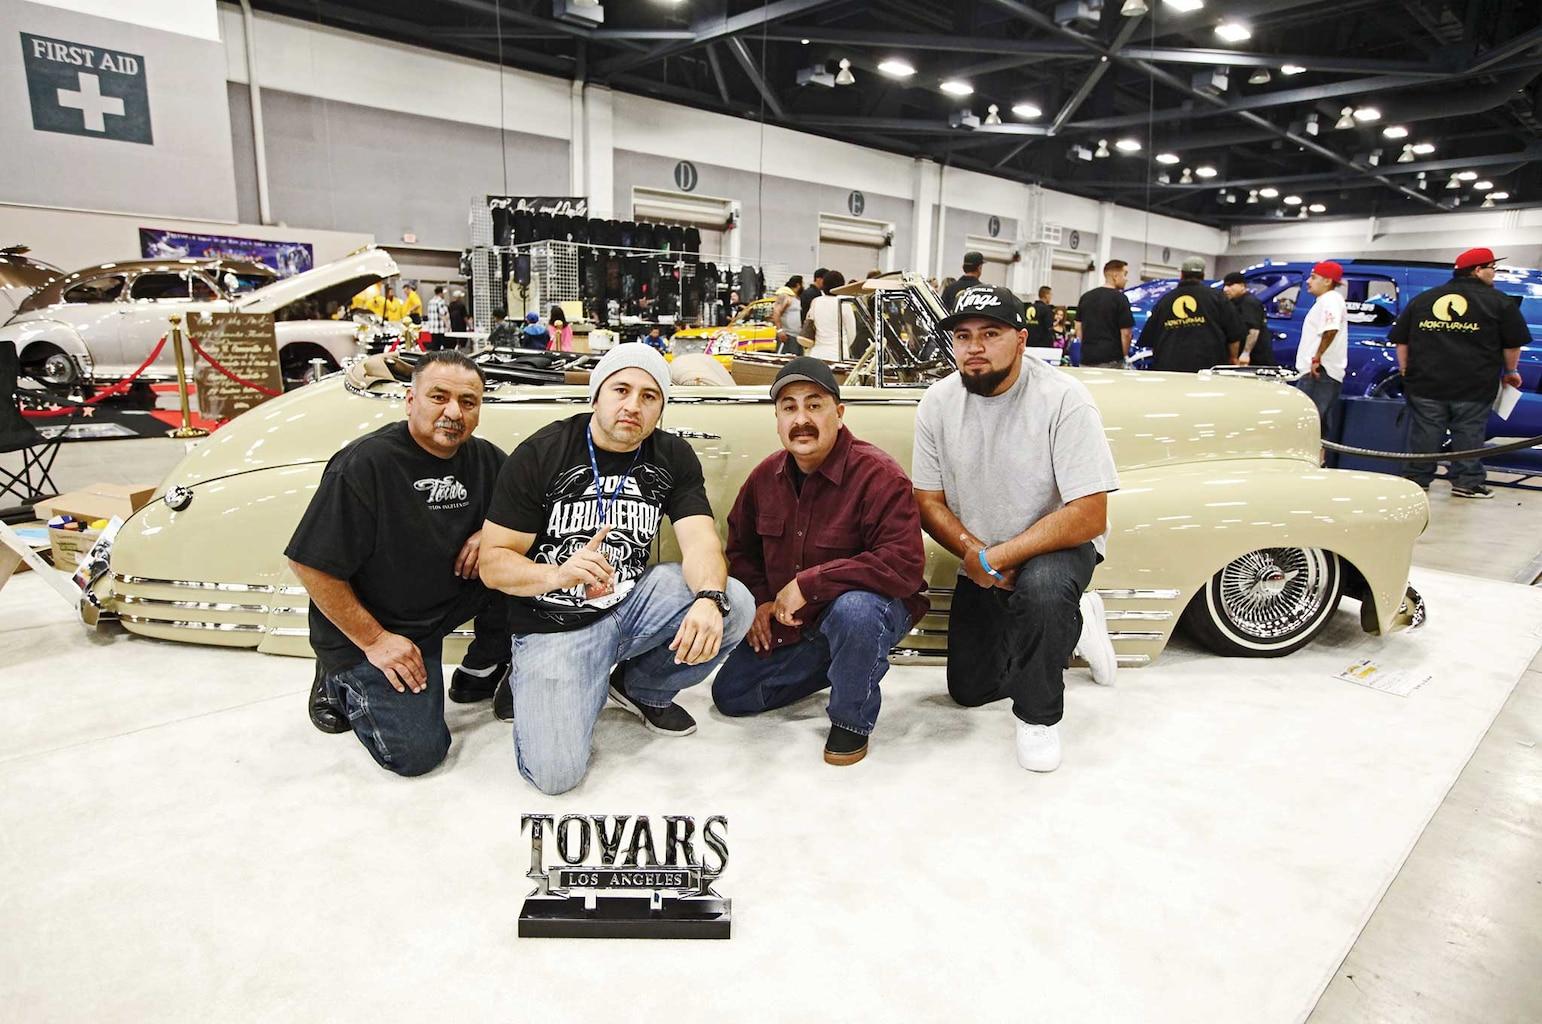 Tovars visit New Mexico